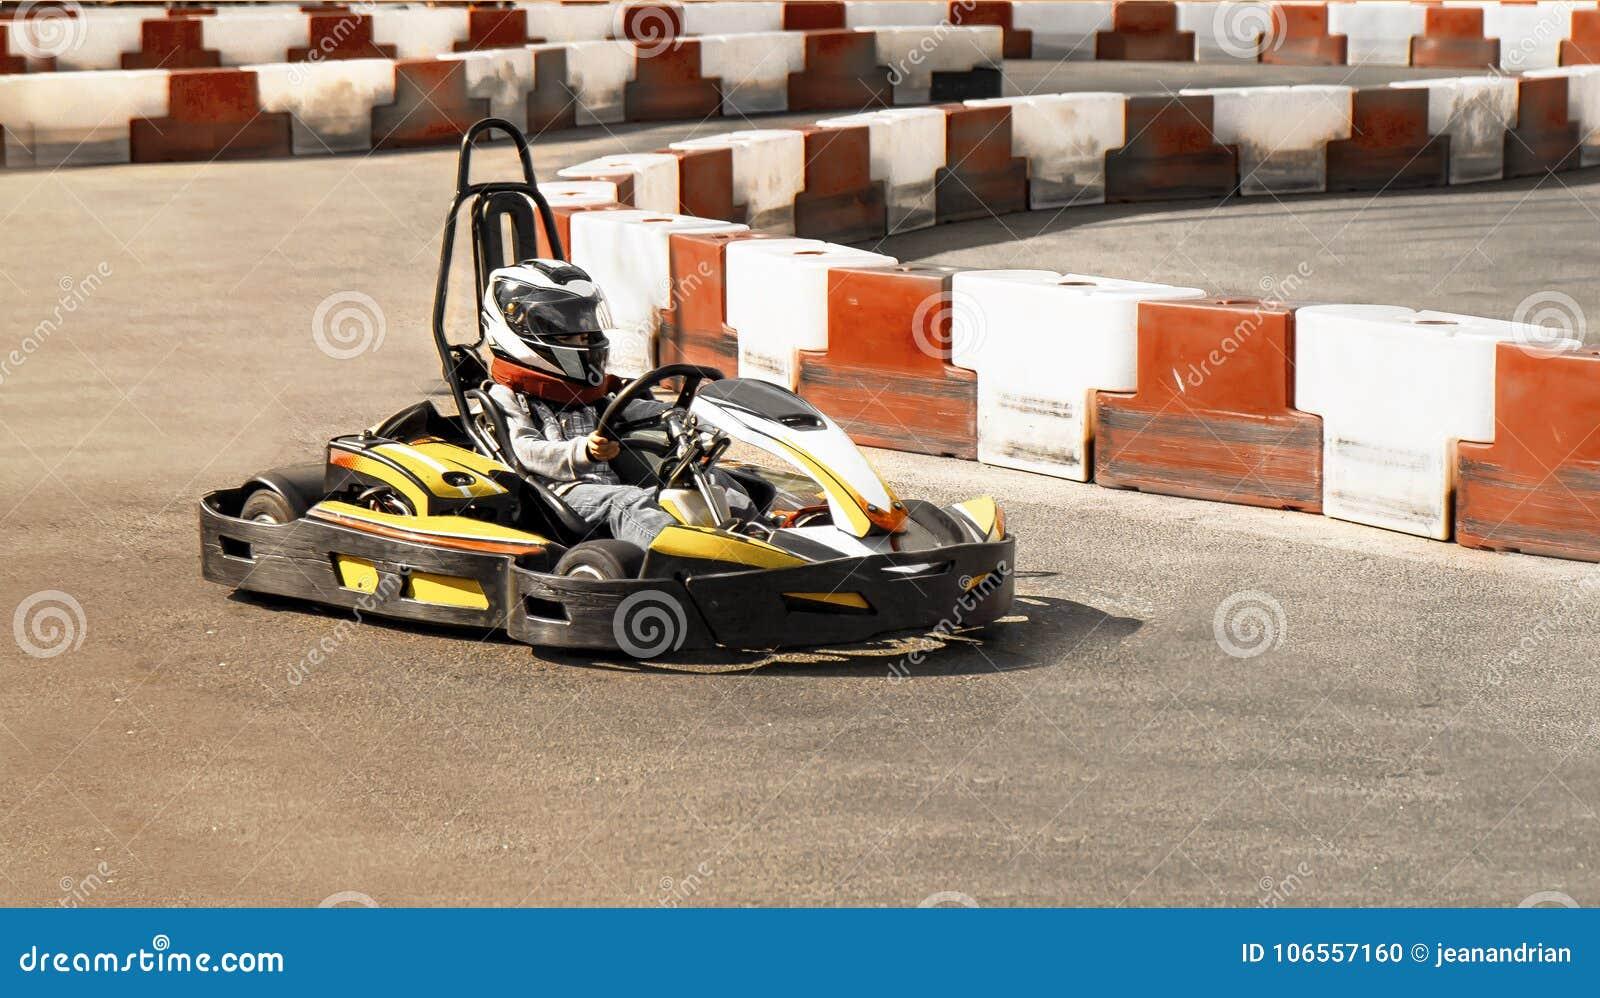 Go Kart, Karting Speed Rival Outdoor Race Opposition Race, Racing